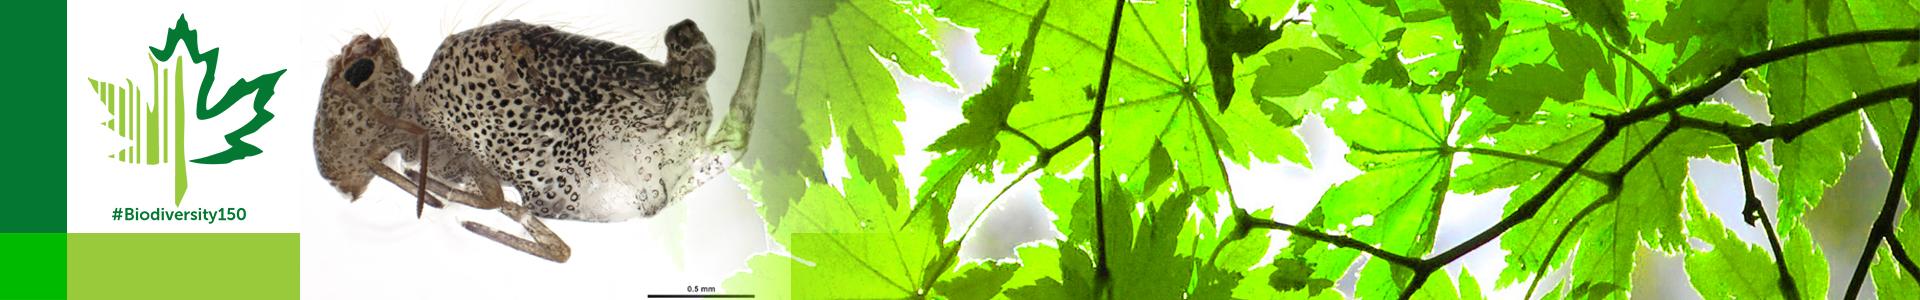 #Biodiversity150 number 16 of 150 Globular Springtail